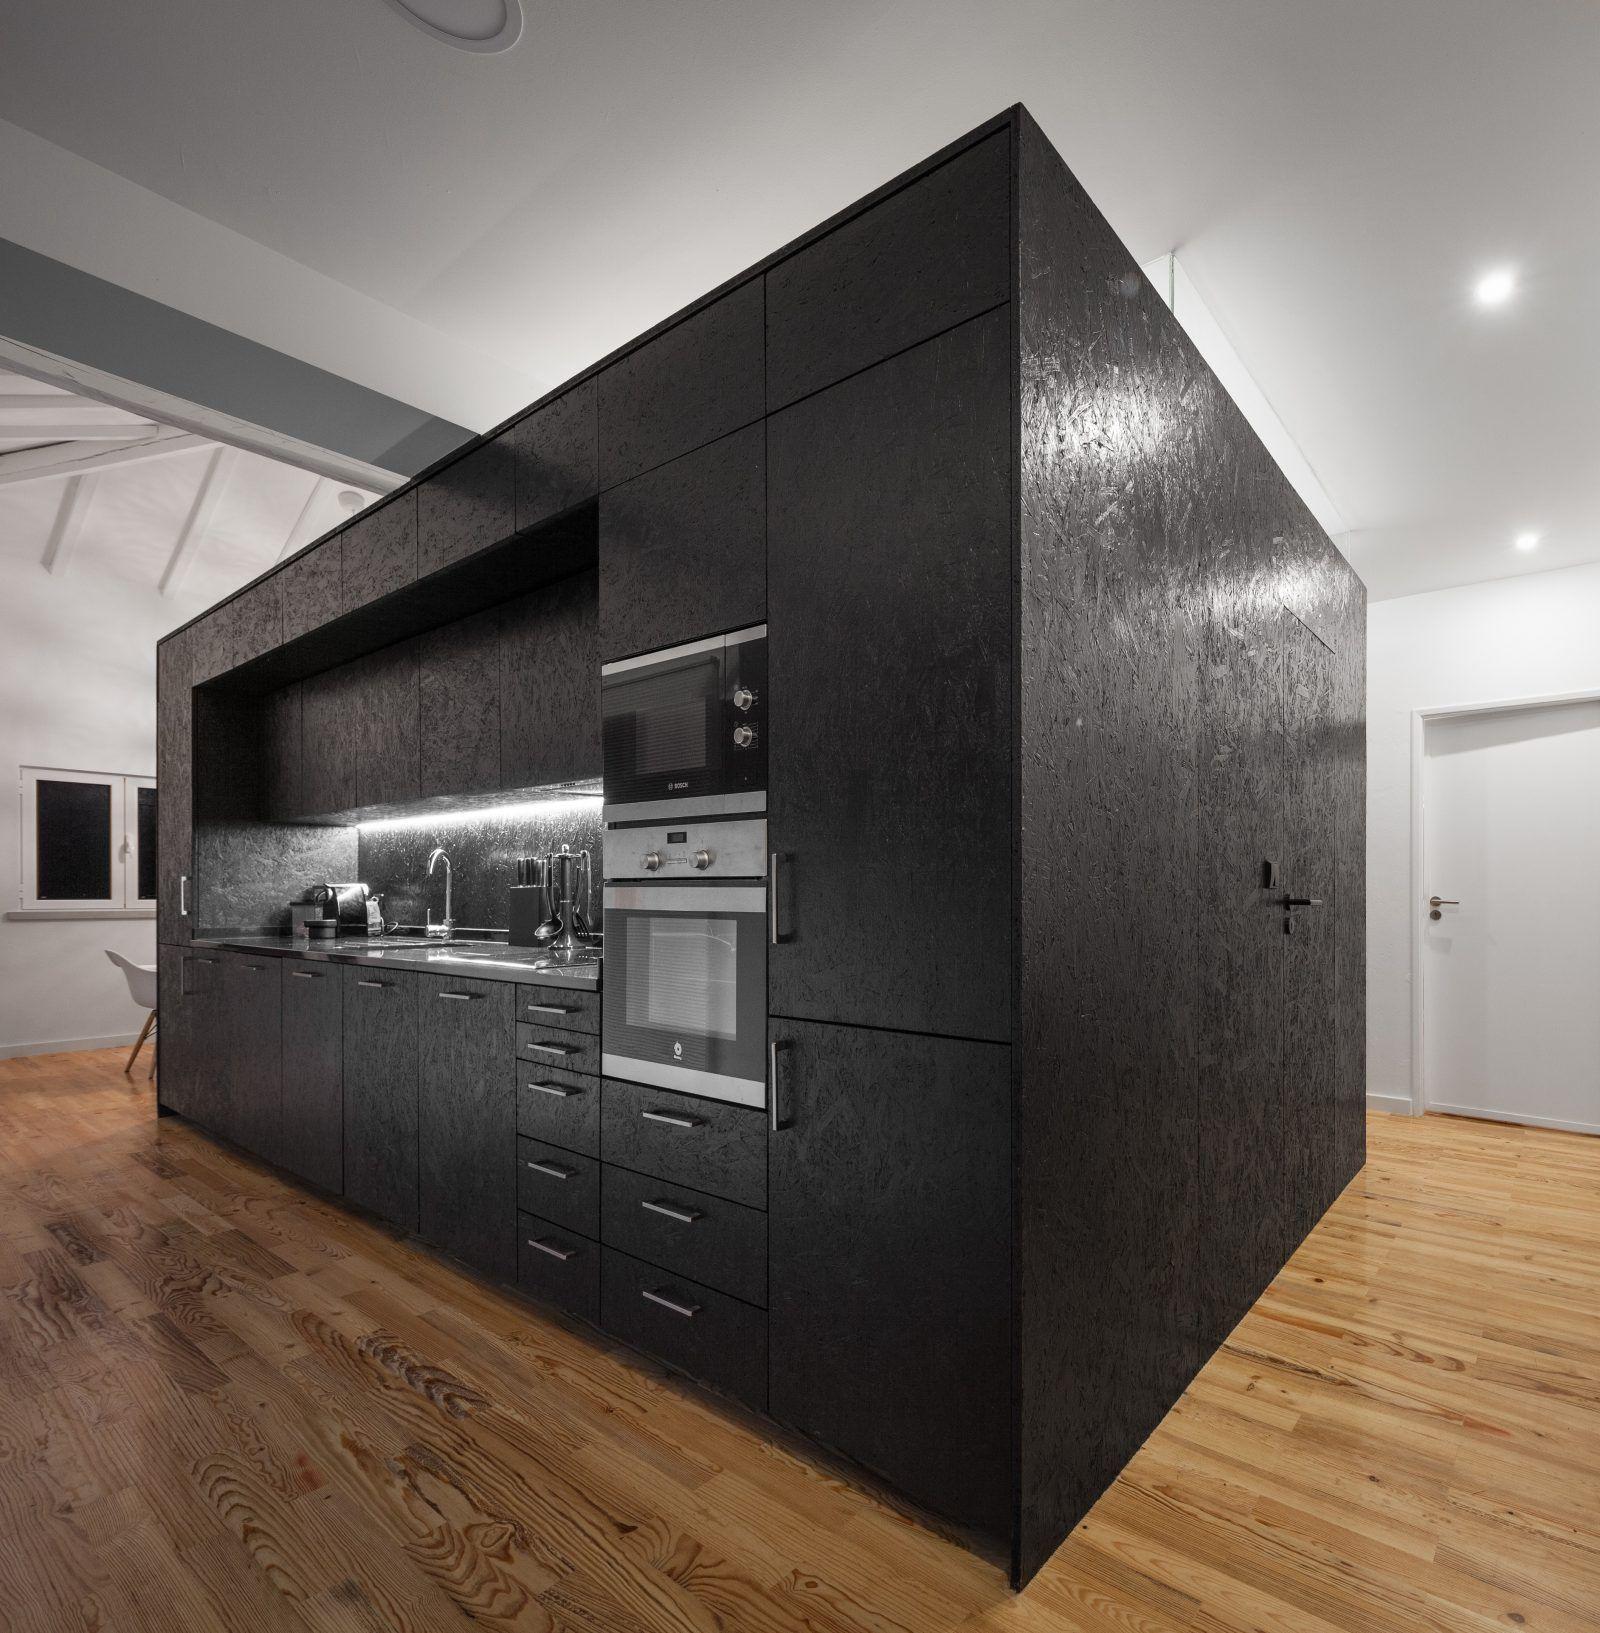 cuisine en osb noir cuisine pinterest osb noir et. Black Bedroom Furniture Sets. Home Design Ideas